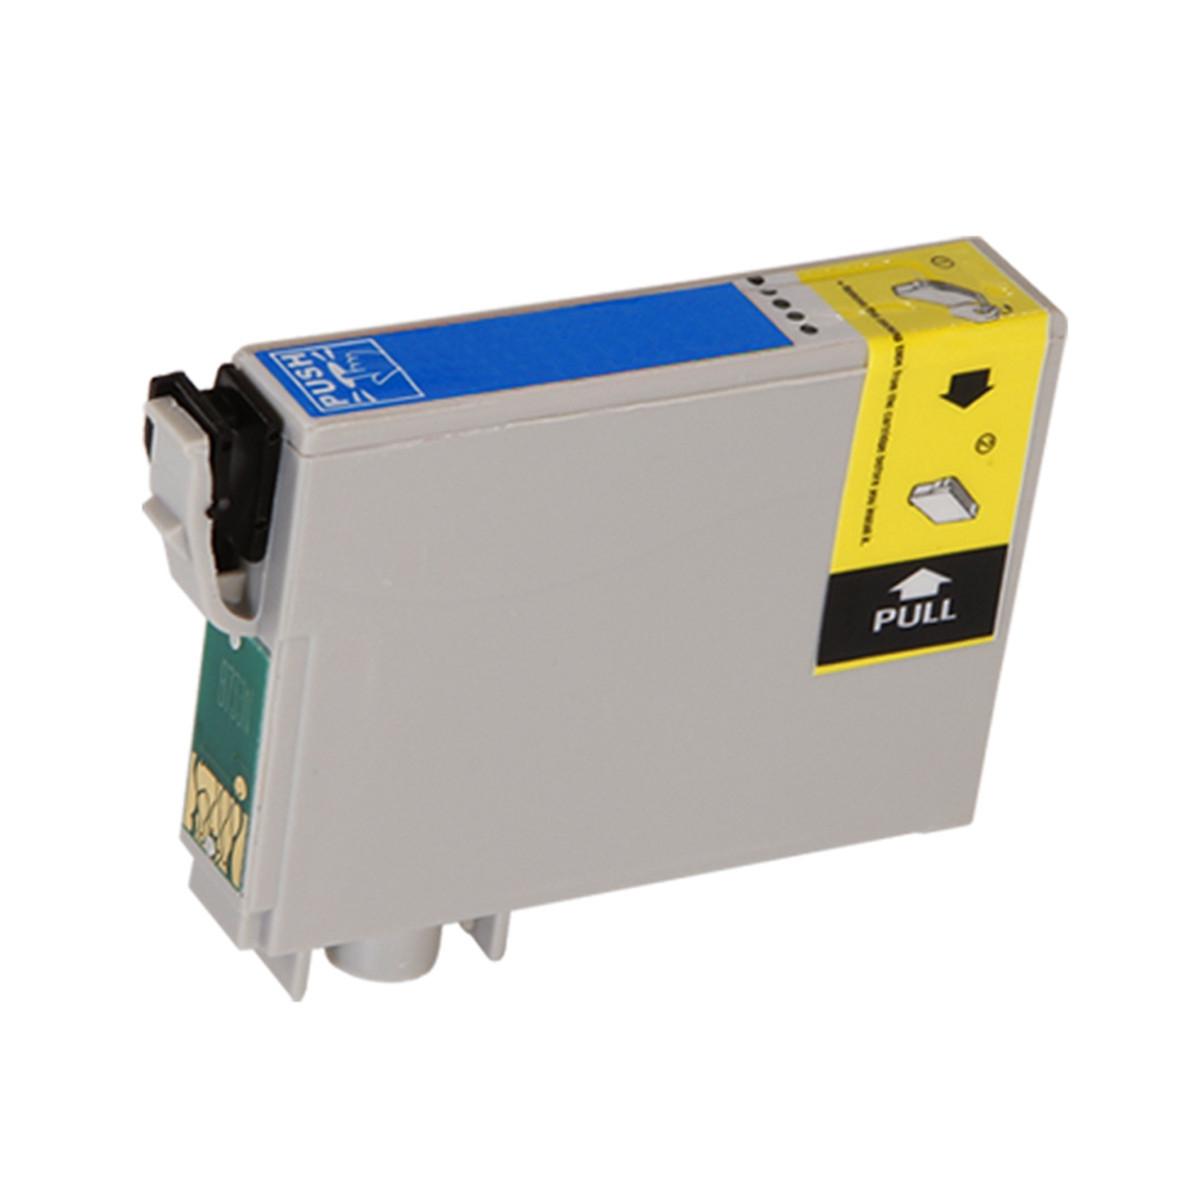 Cartucho de Tinta Compatível com Epson T048 T0482 T048220 Ciano | RX600 R220 RX500 R200 | 12ml